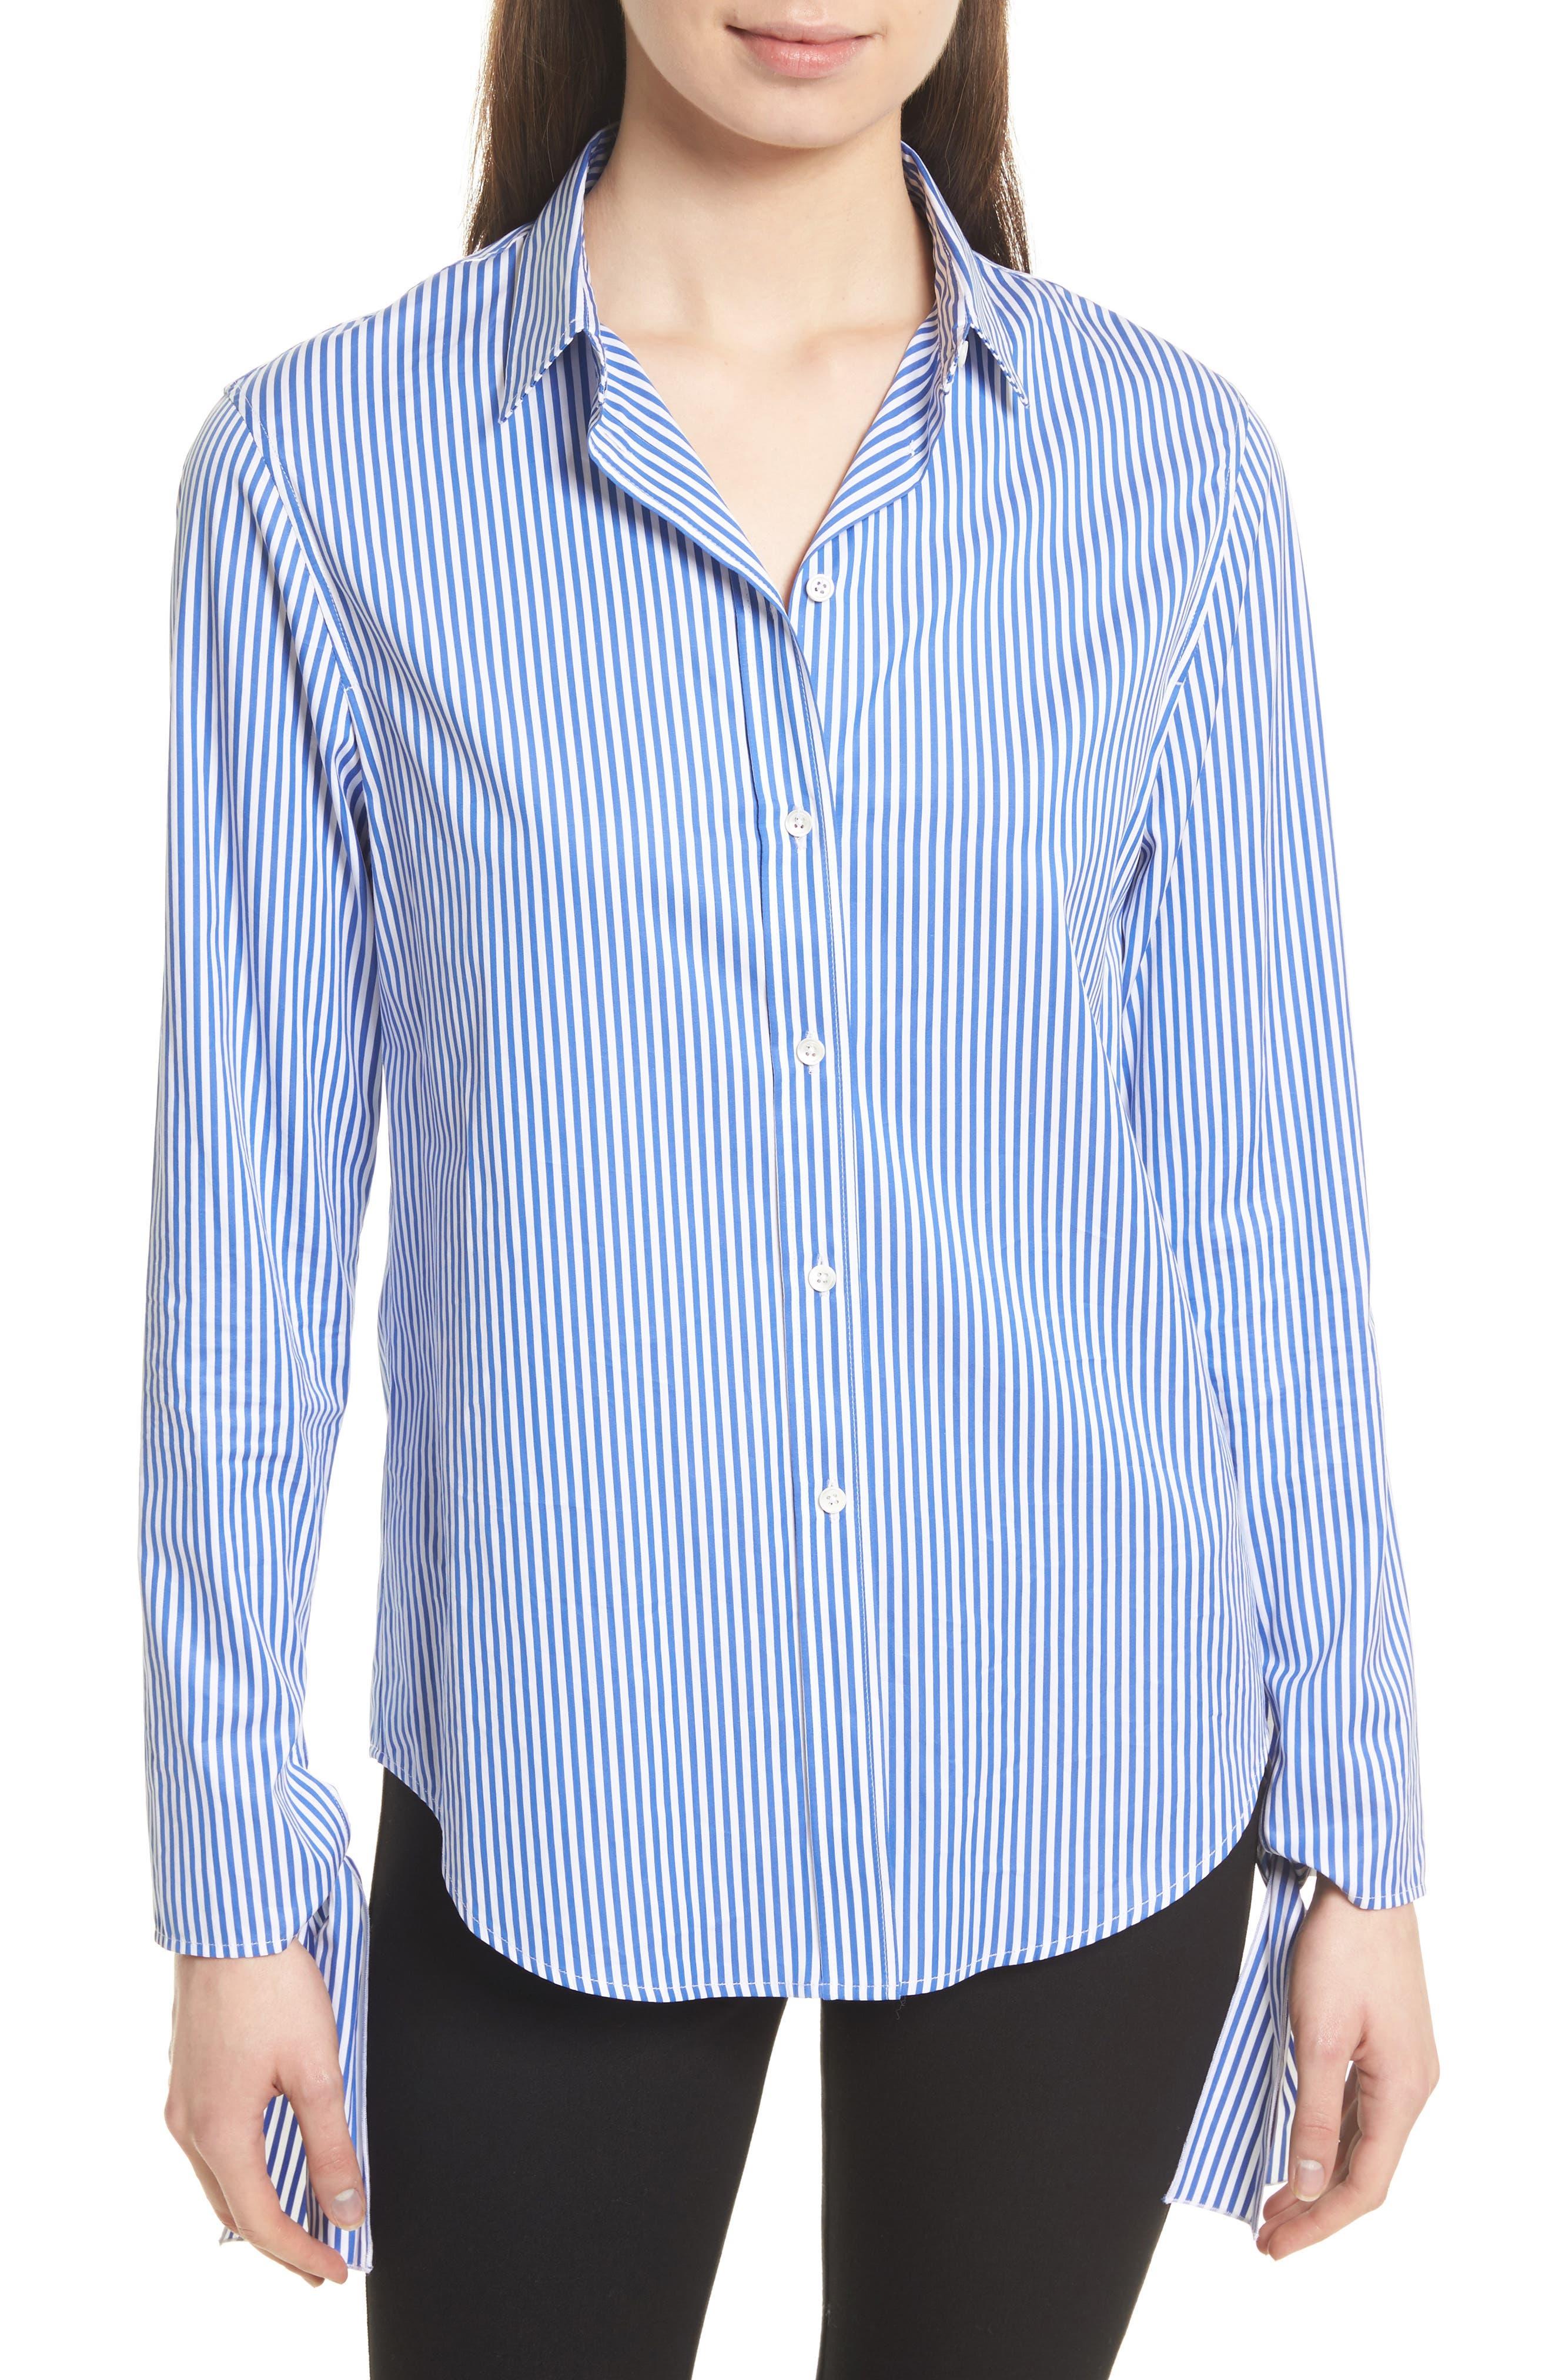 Thomas Stripe Forever Tie Cuff Shirt,                         Main,                         color, Blue/ White